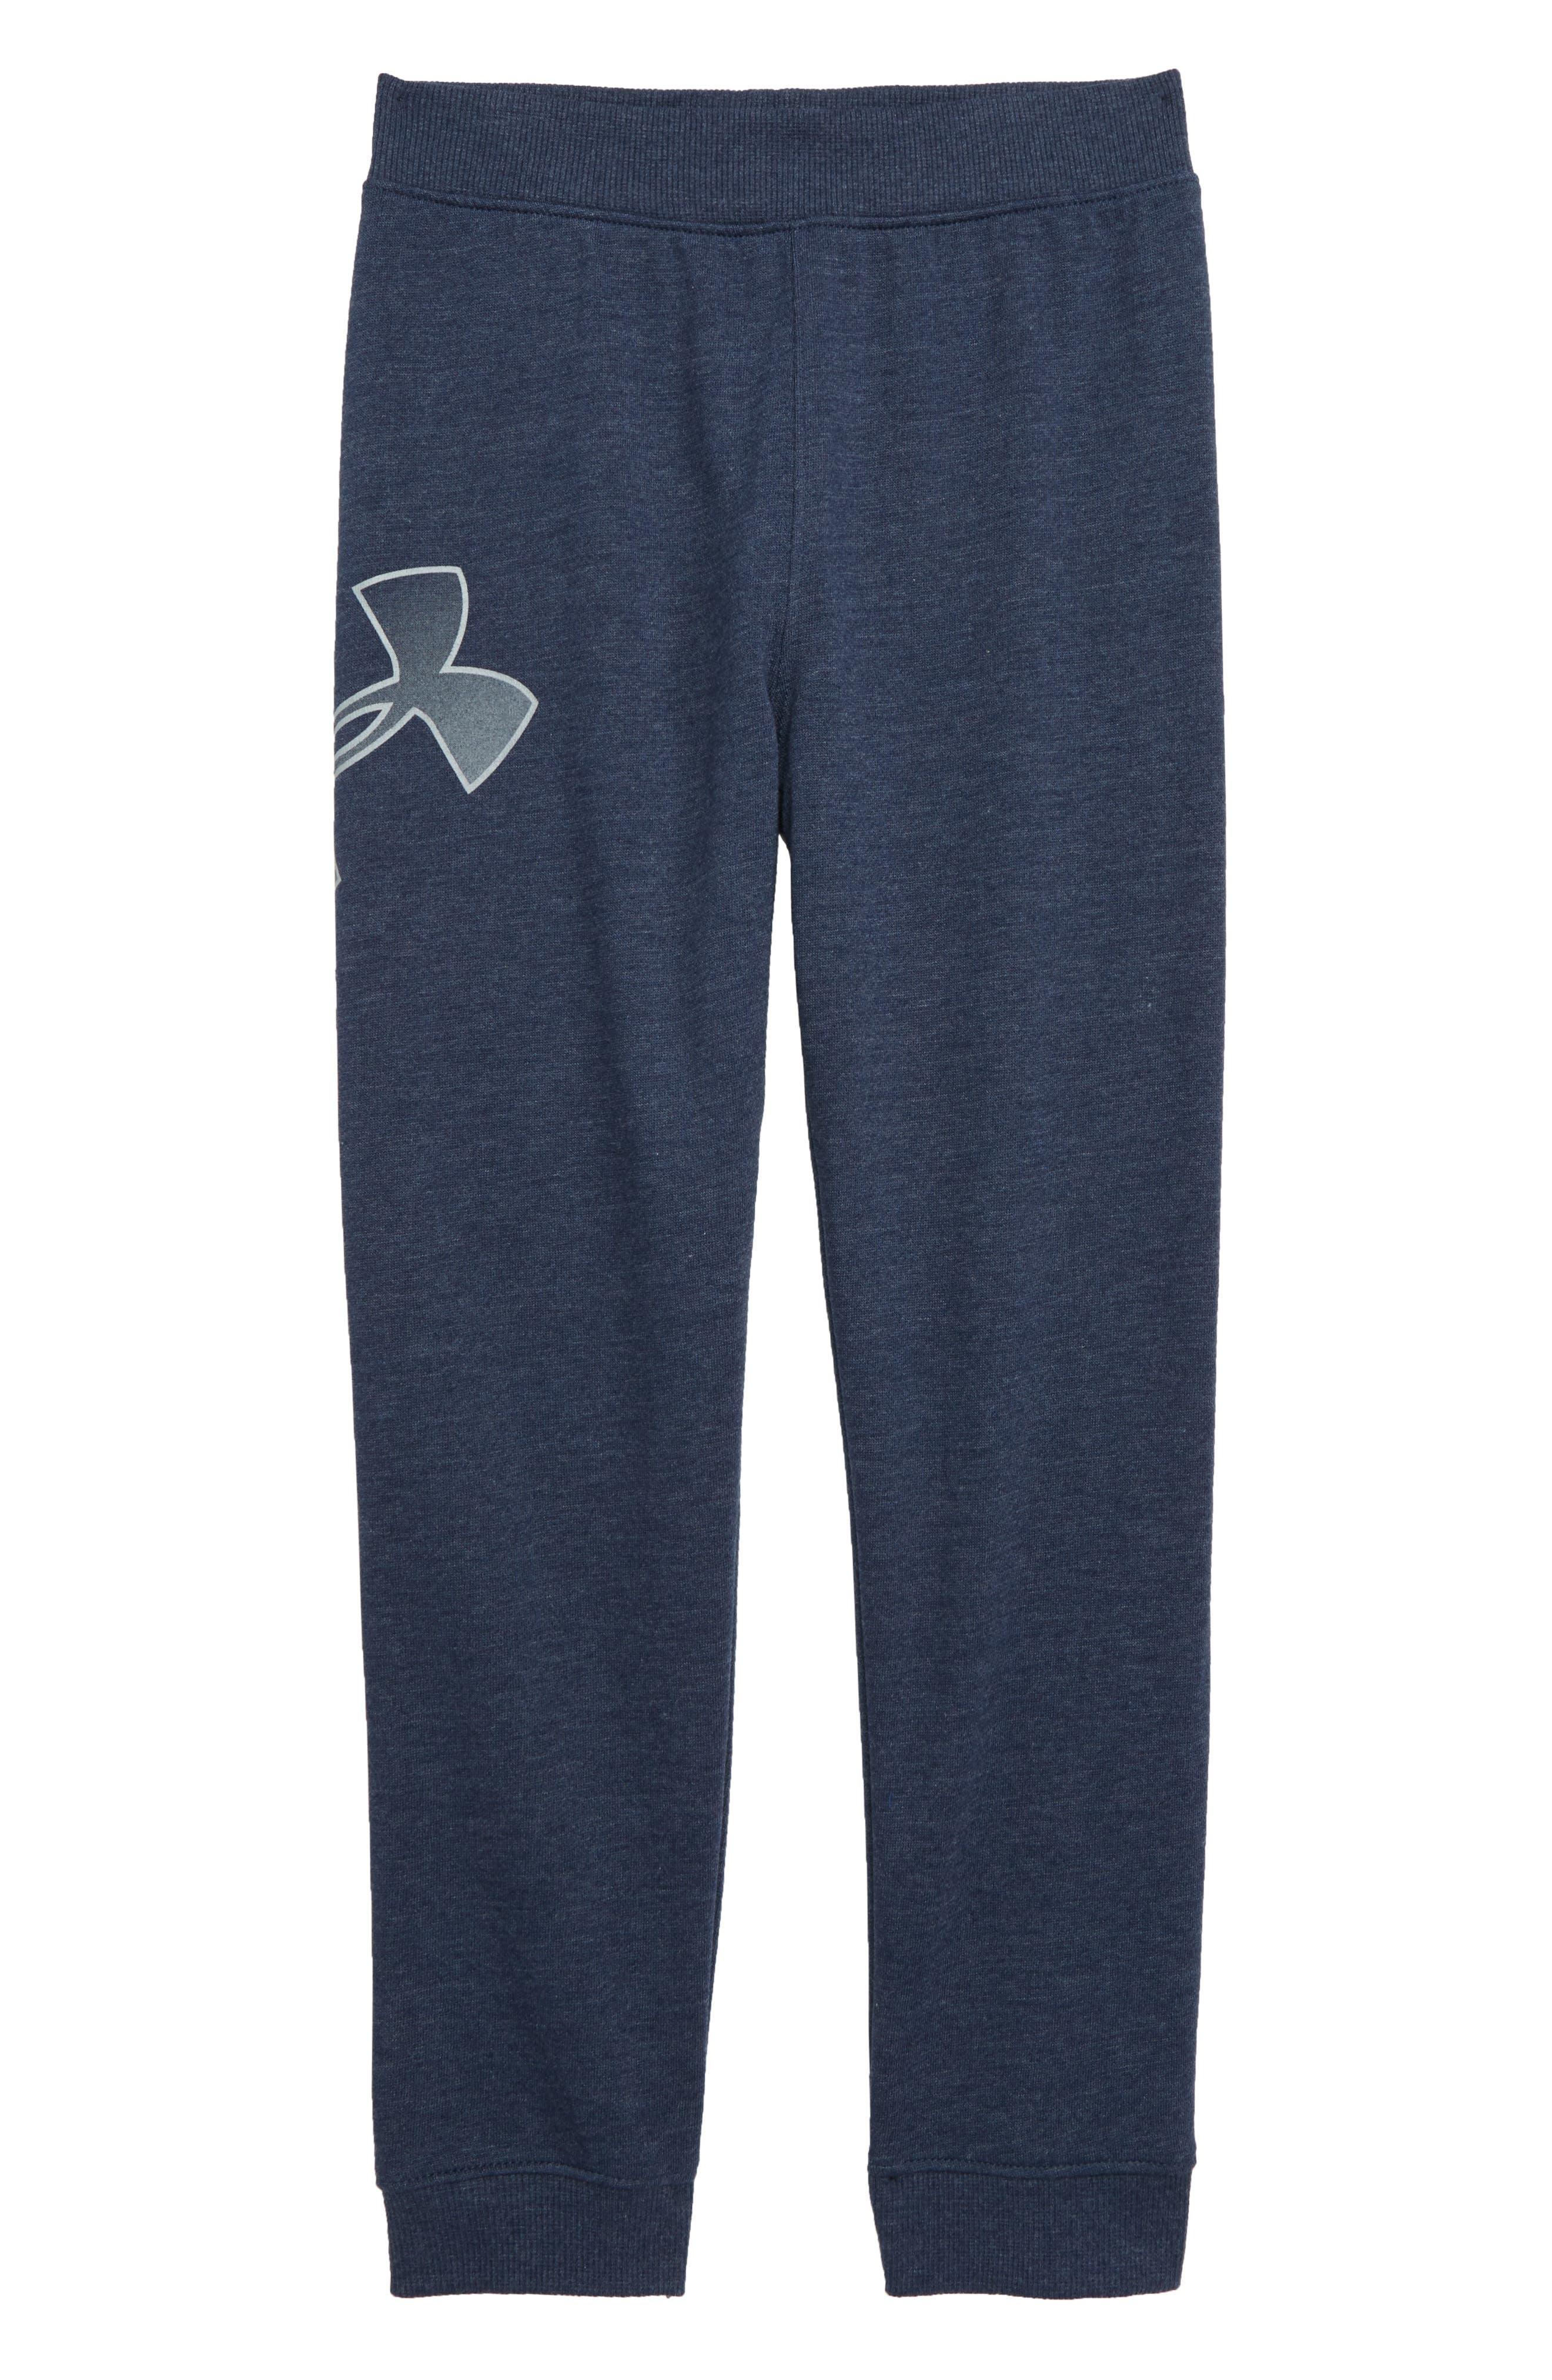 Fade Out Logo Jogger Pants, Main, color, ACADEMY